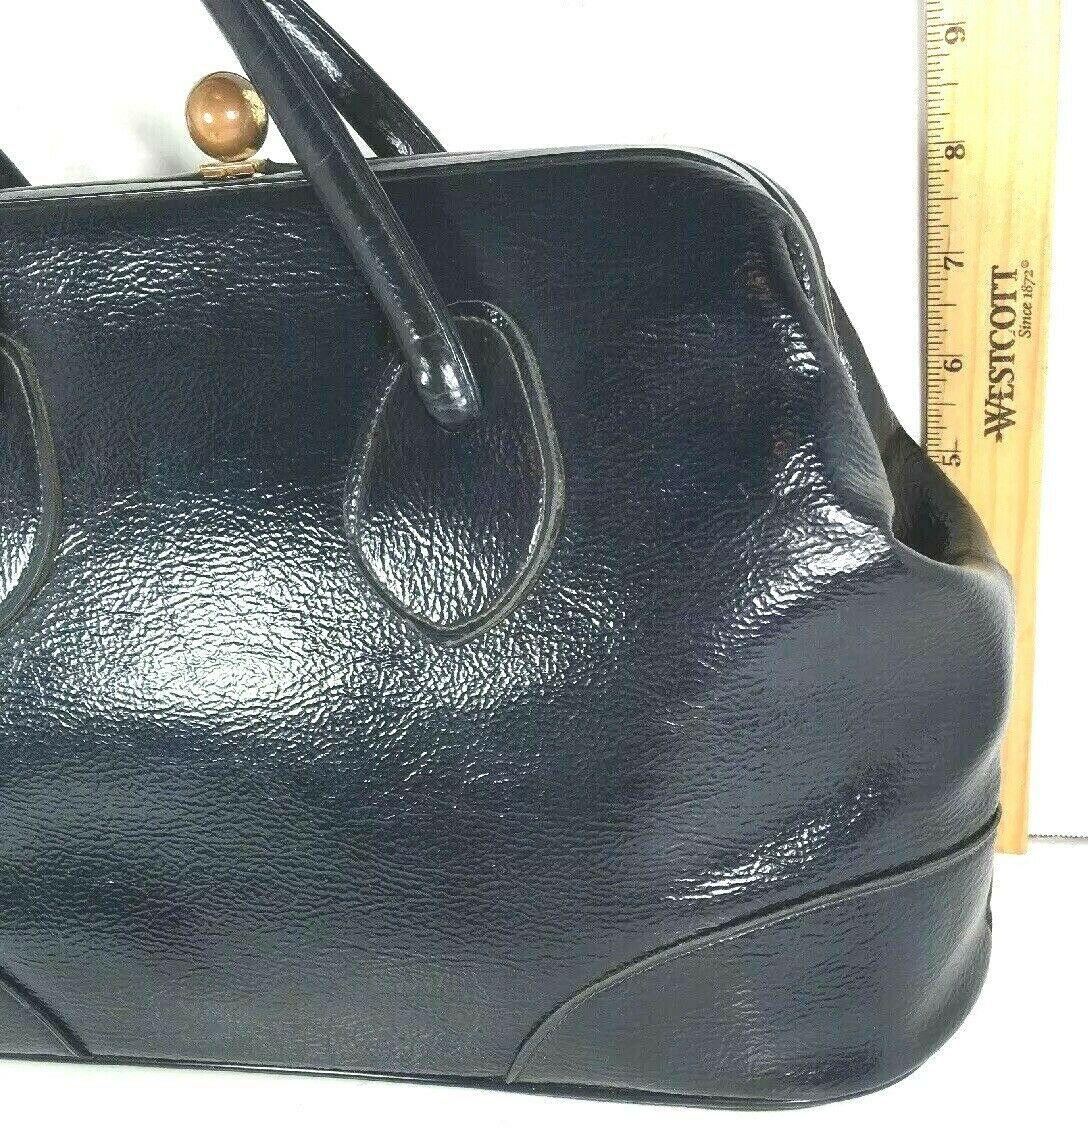 Garay True Vintage Large Navy Blue Faux Leather Handbag